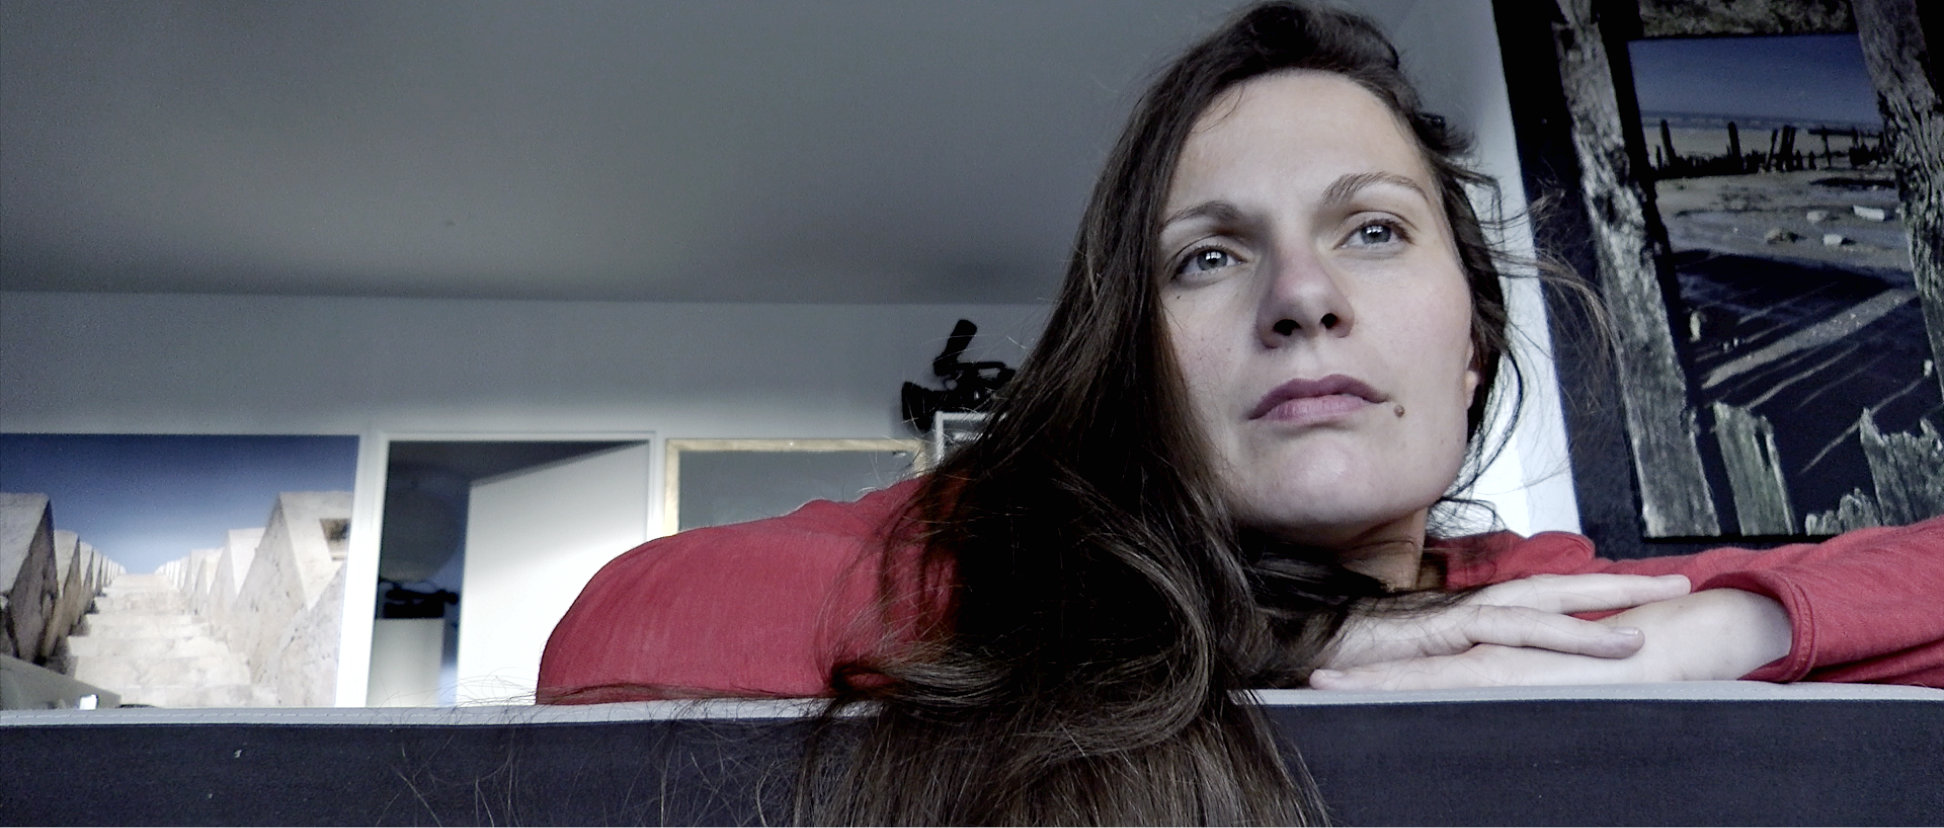 actress and producer Stephanie Benamra